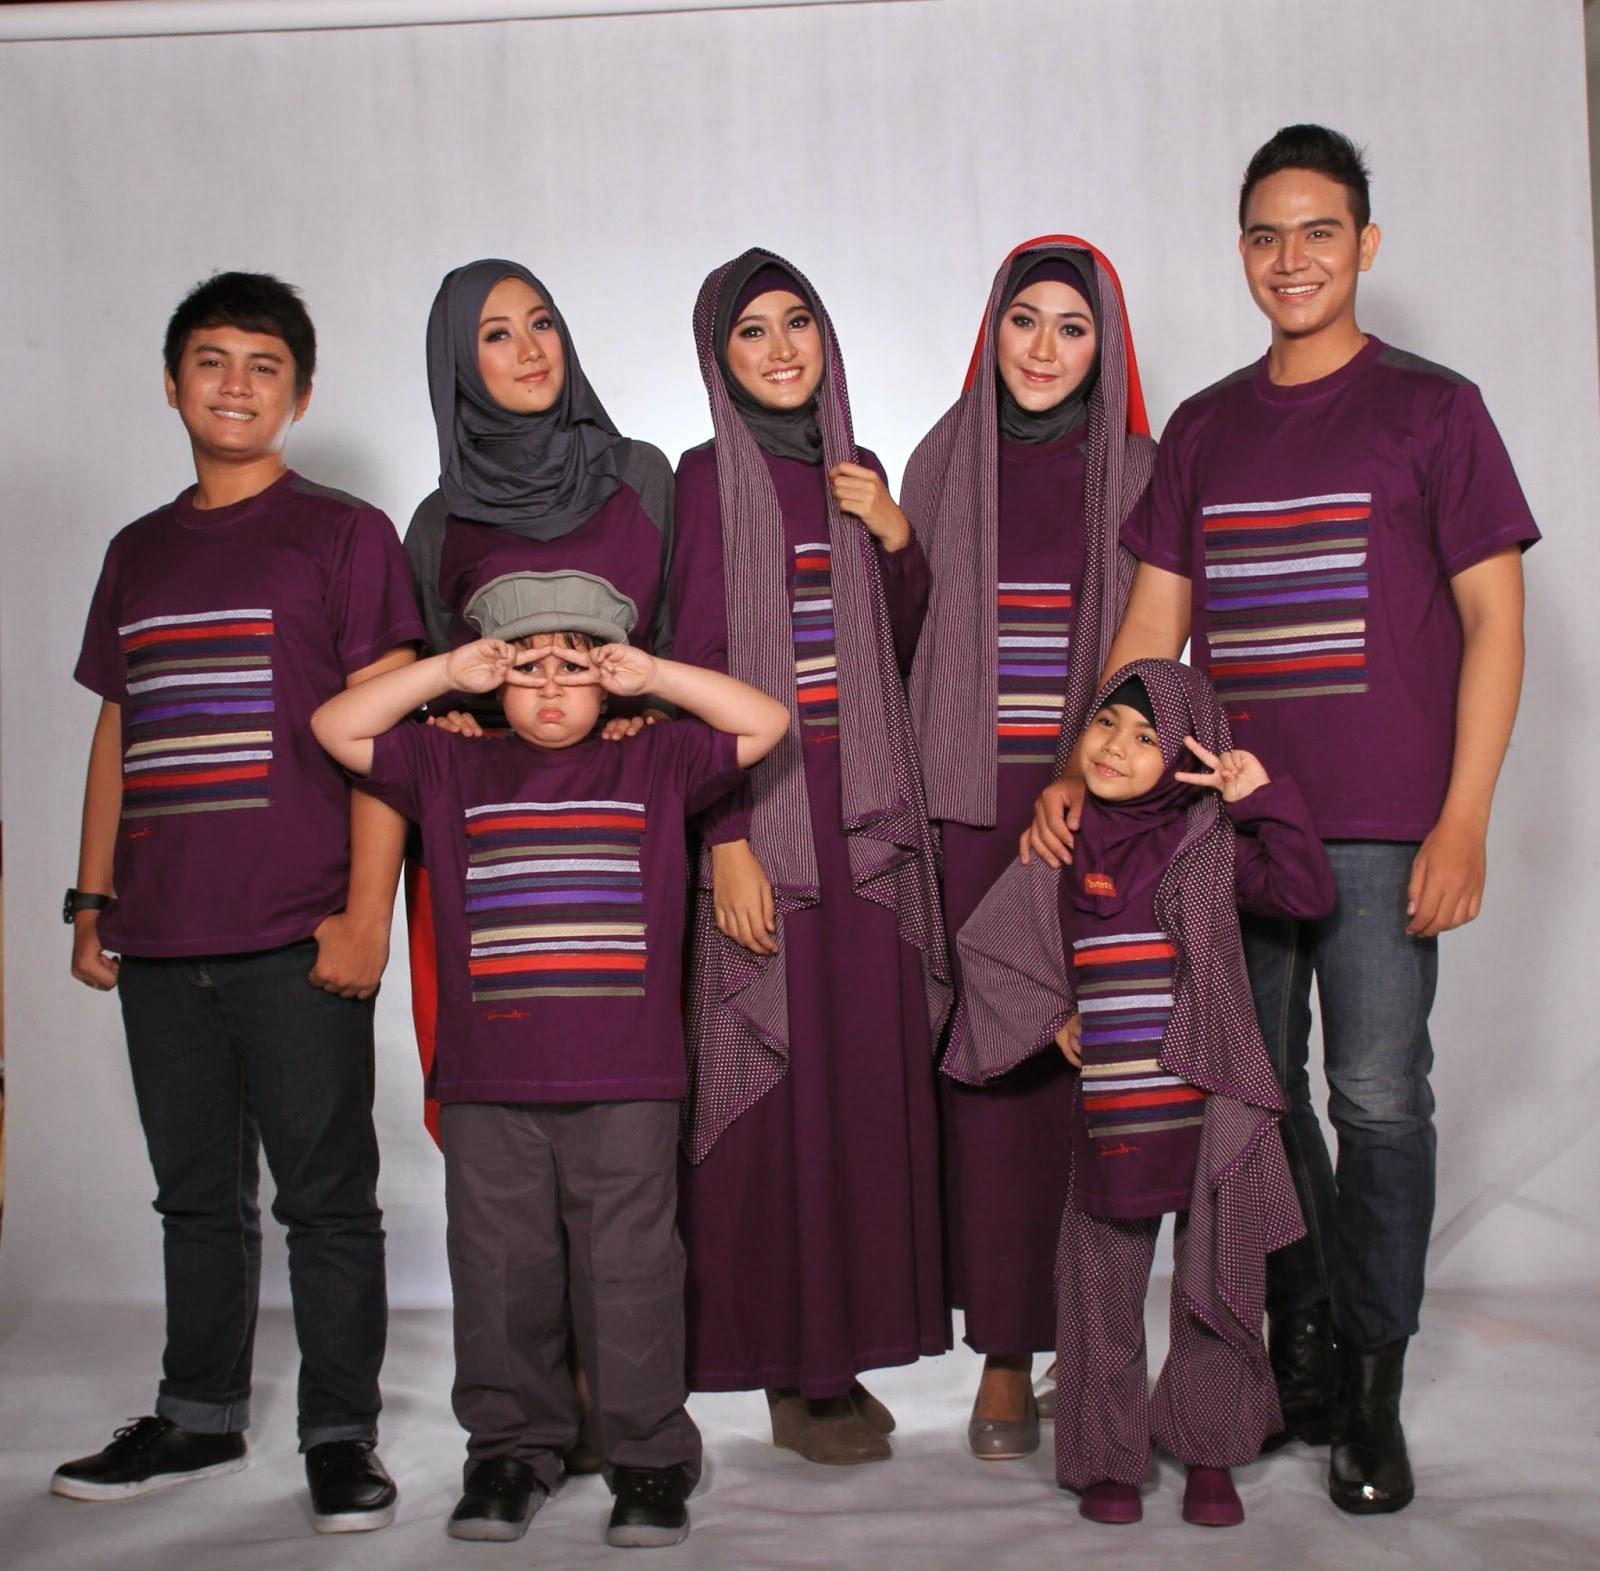 Design Model Baju Lebaran 2018 Keluarga Whdr Model Baju Keluarga Untuk Hari Raya Lebaran 2018